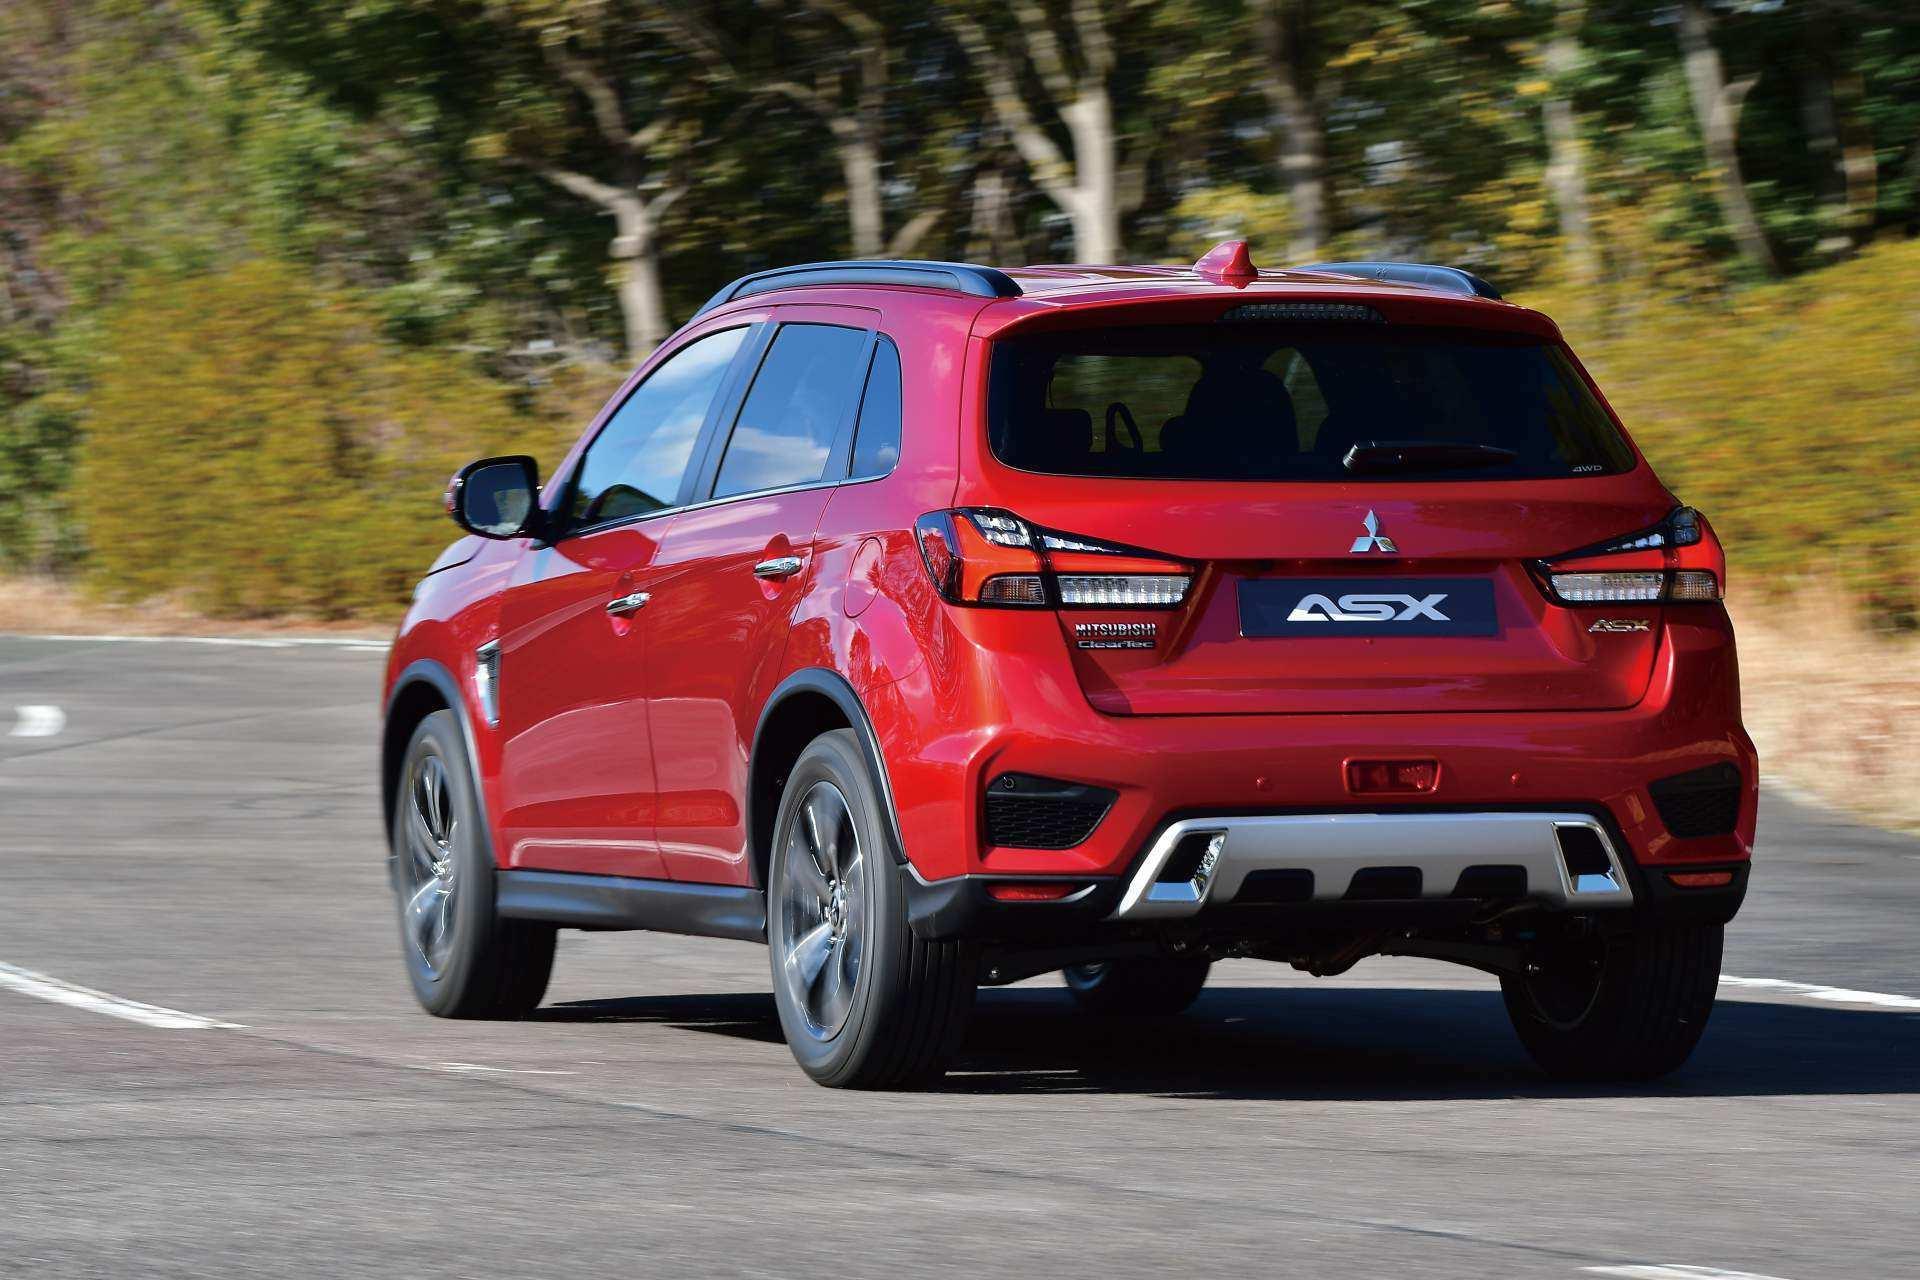 81 Great Mitsubishi Asx 2020 Wymiary Performance with Mitsubishi Asx 2020 Wymiary